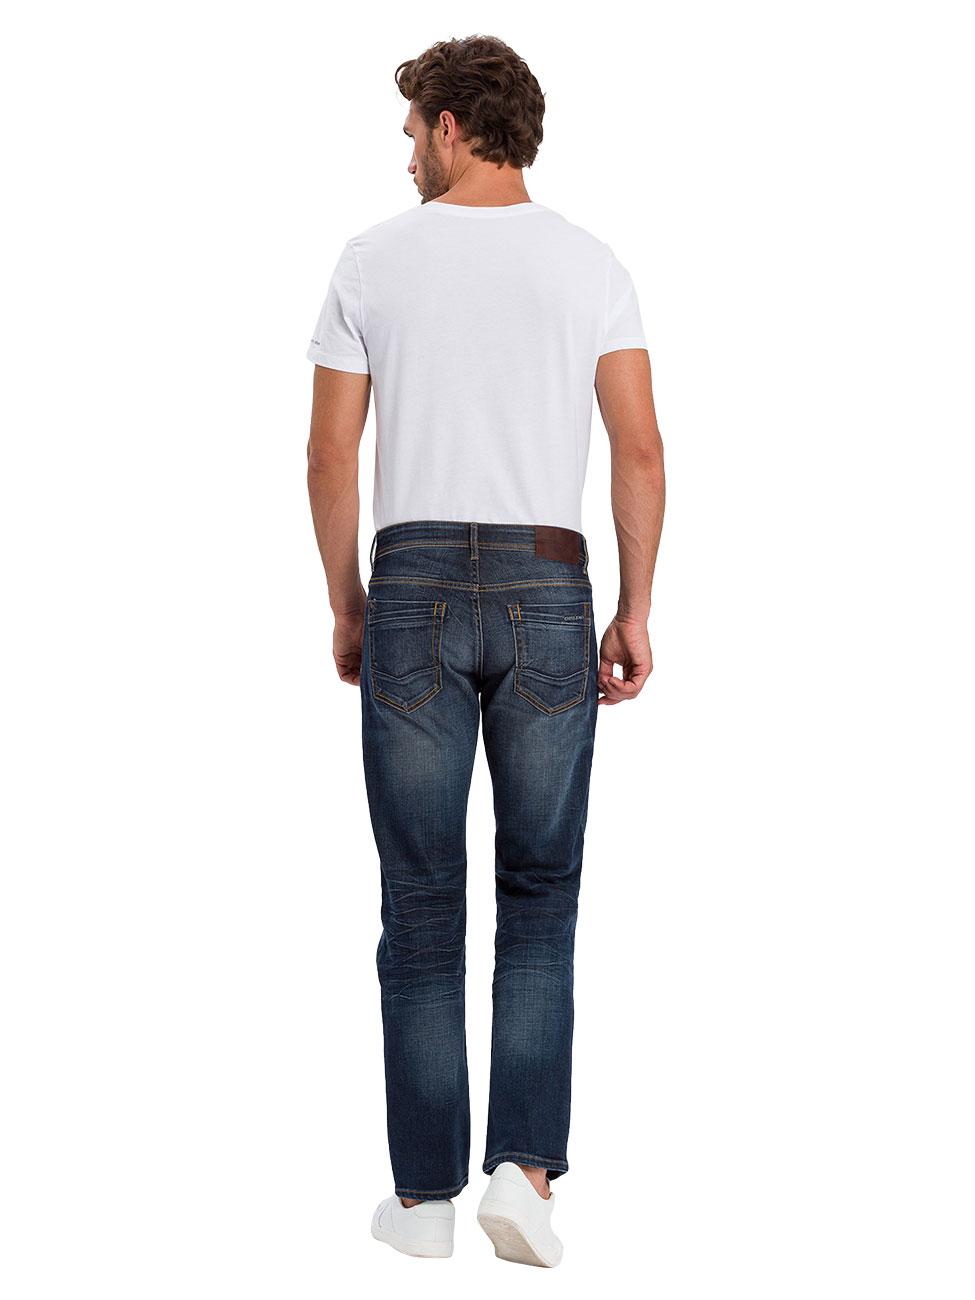 cross-jeans-herren-jeans-antonio-relax-fit-blau-dark-blue